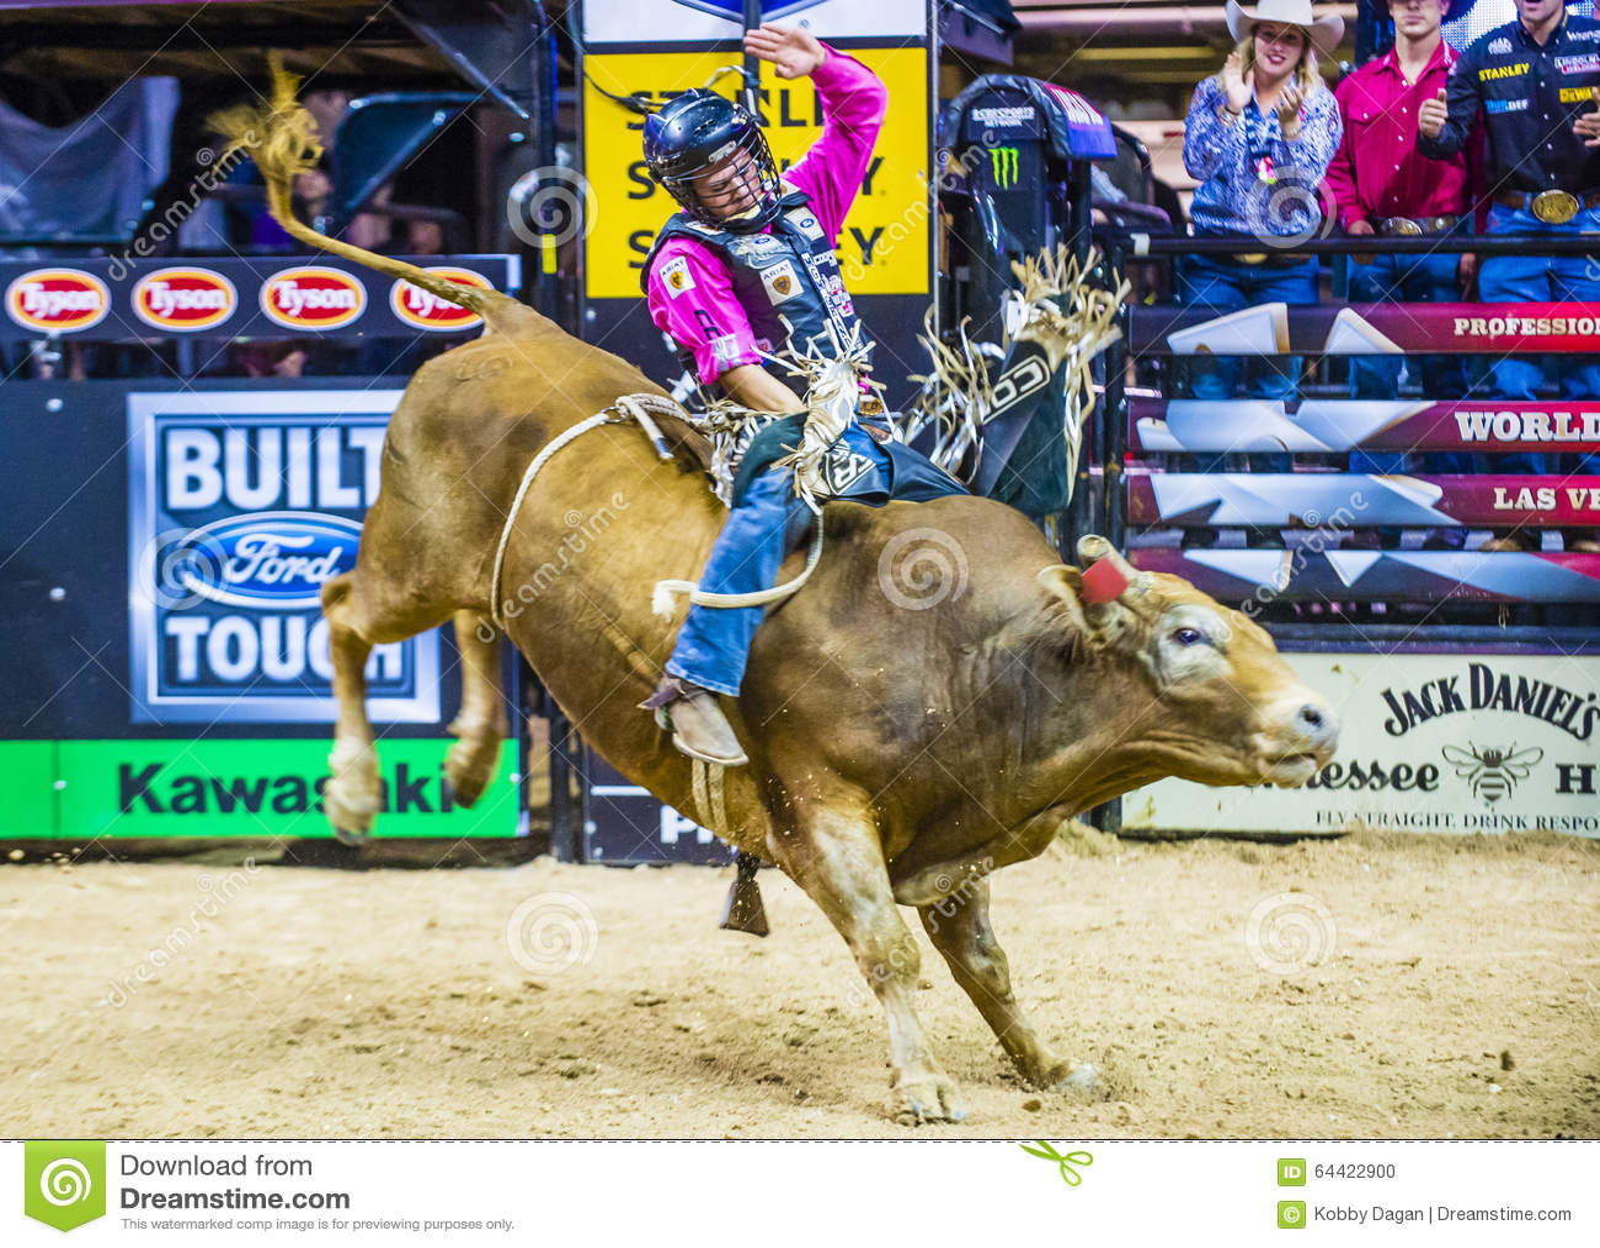 pbr bull riding world finals editorial image - image of west, dakota